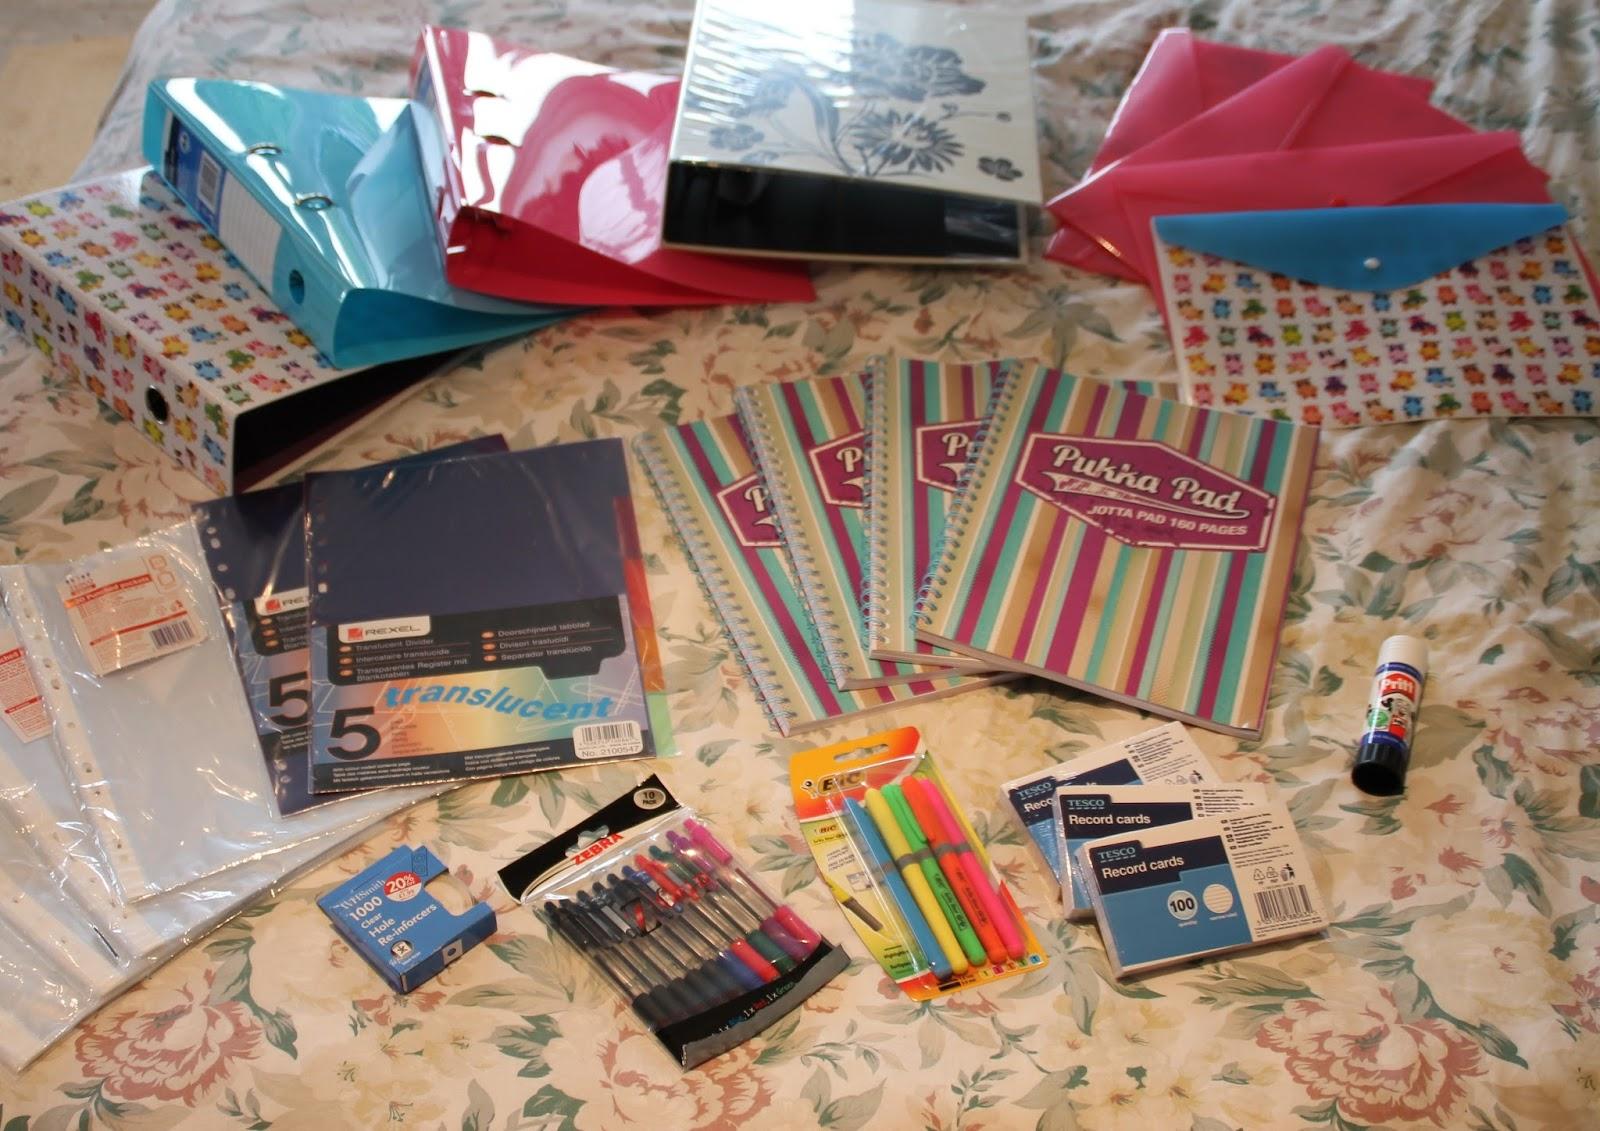 Back To School Series 1 Stationary School Supplies Haul